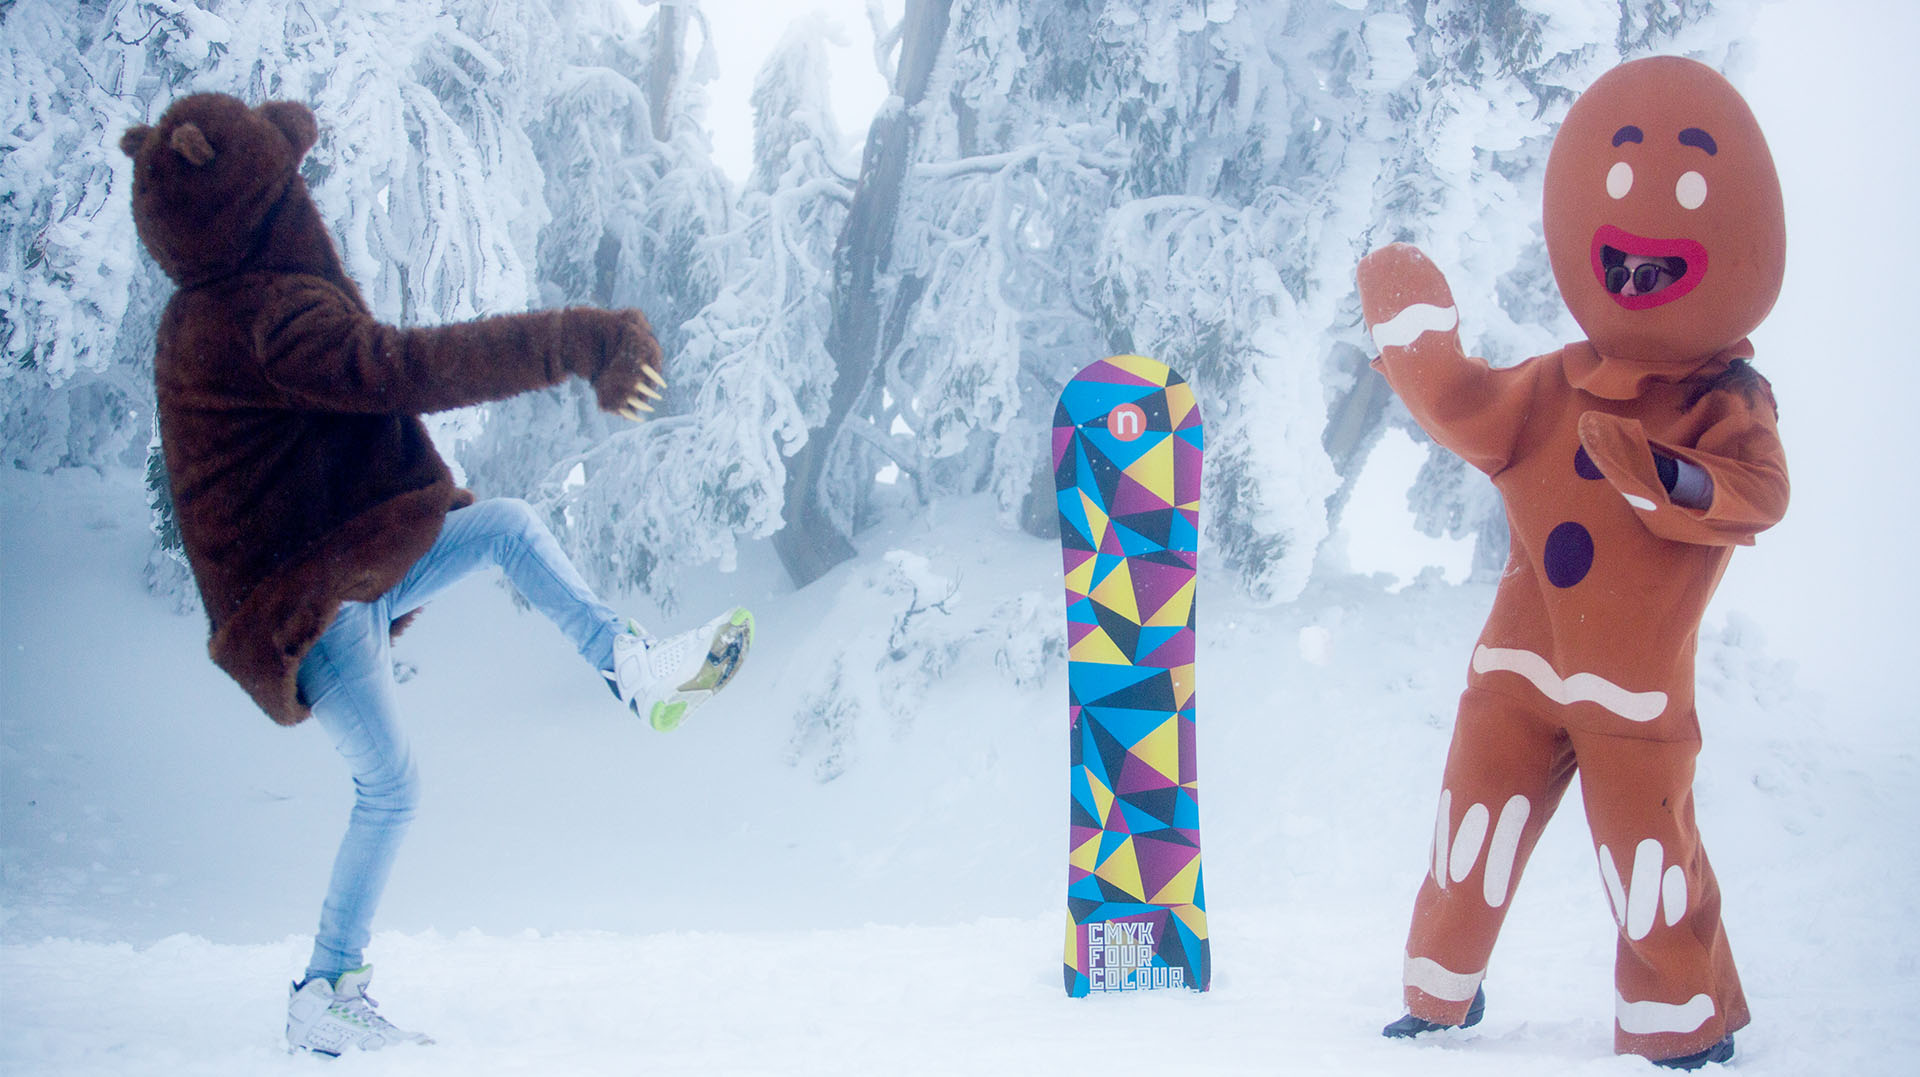 Snowboard 17